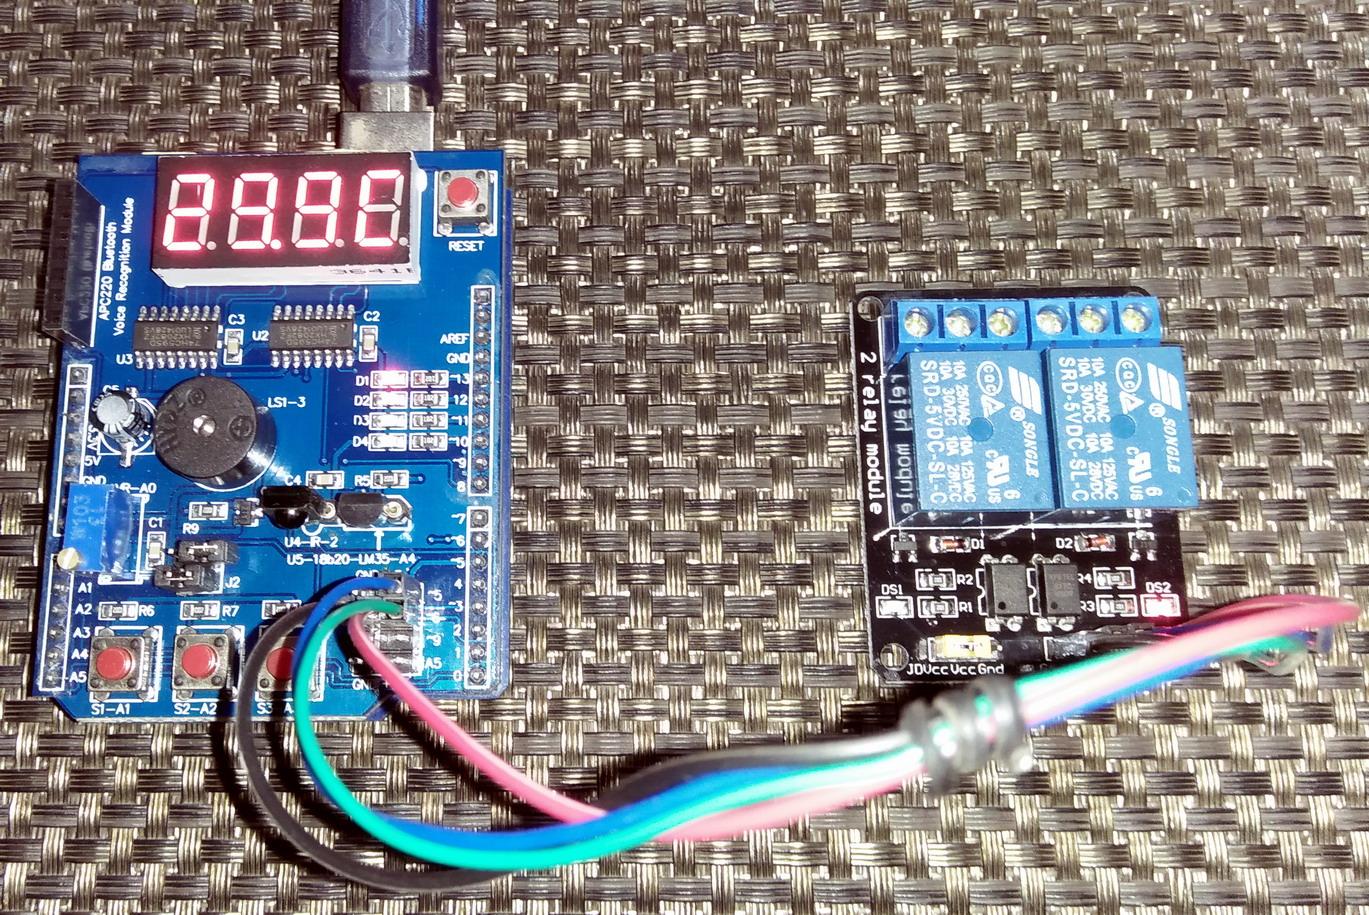 LibStock Arduino Multi Function Shield Demo Temperature Controller #1772B4